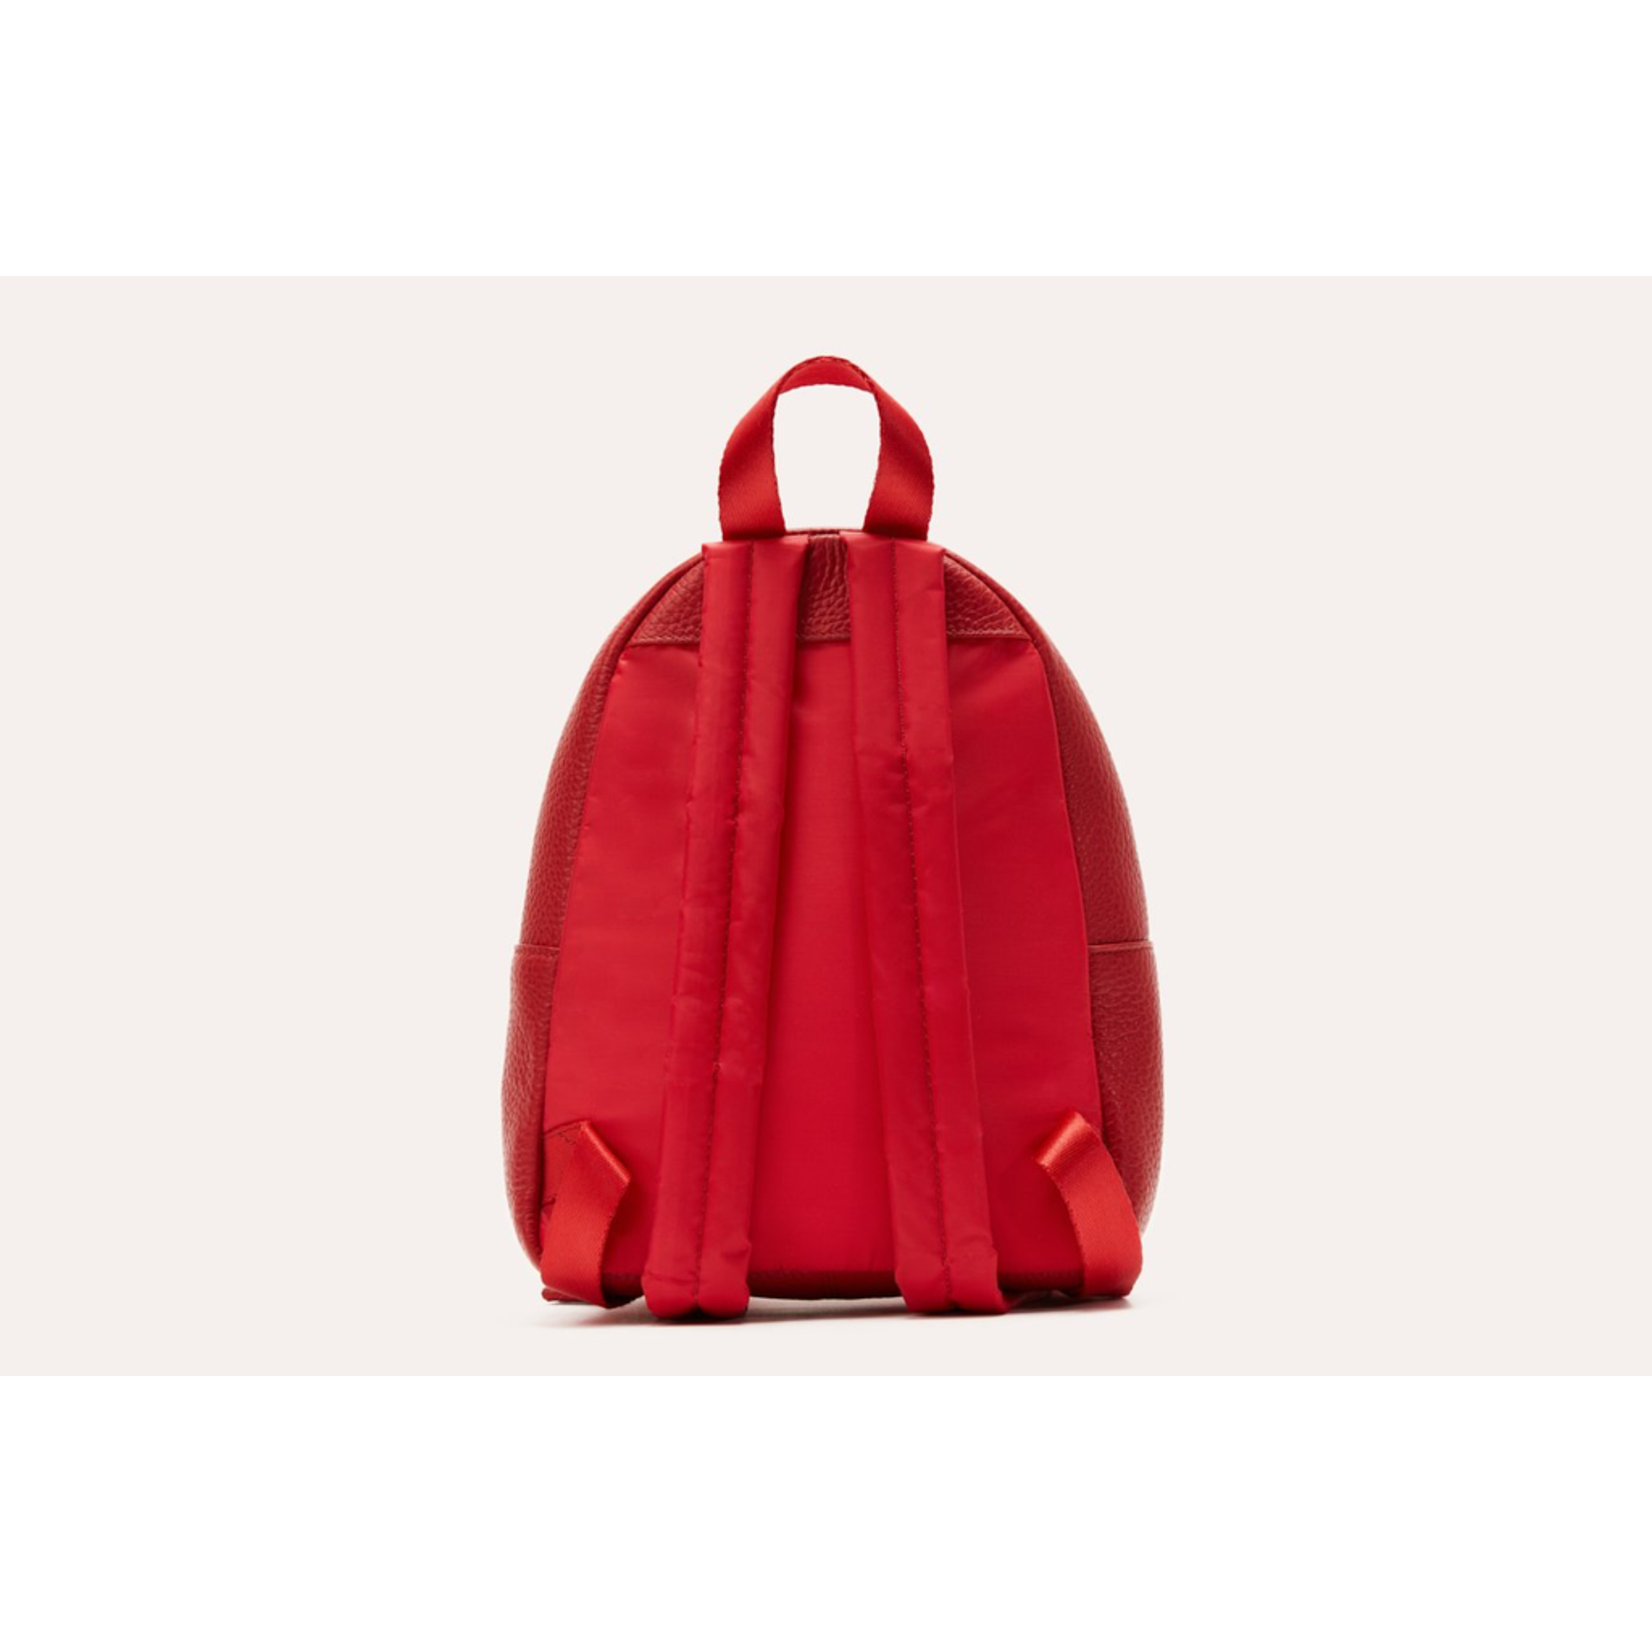 Kiko Leather Small Backpack